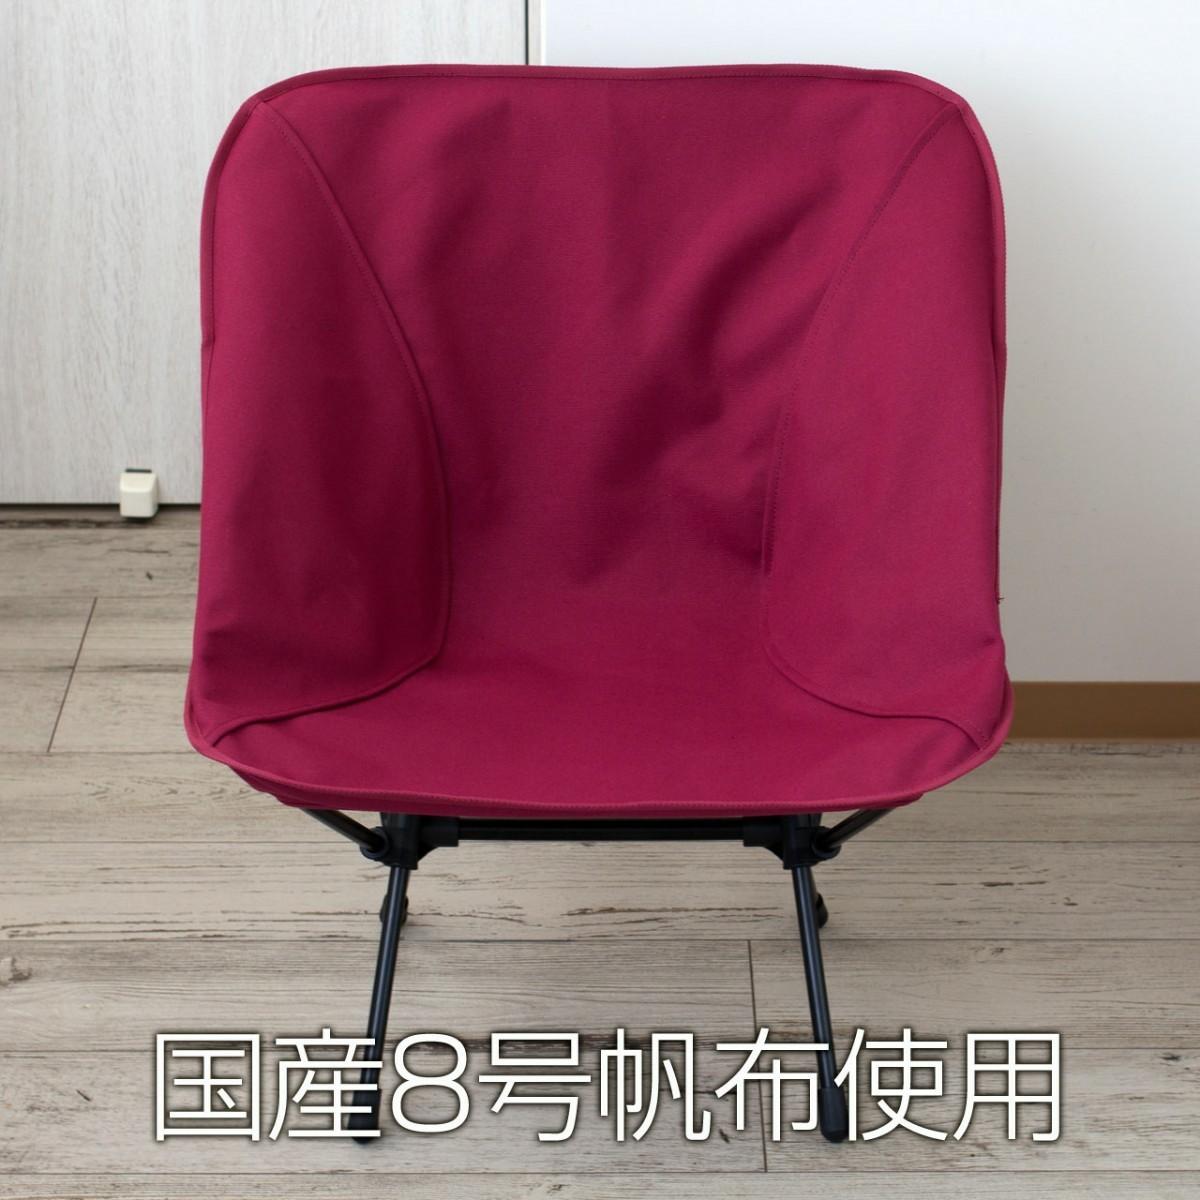 Helinox ヘリノックス チェアワン 専用カバー(8号帆布・焚き火対応)BG